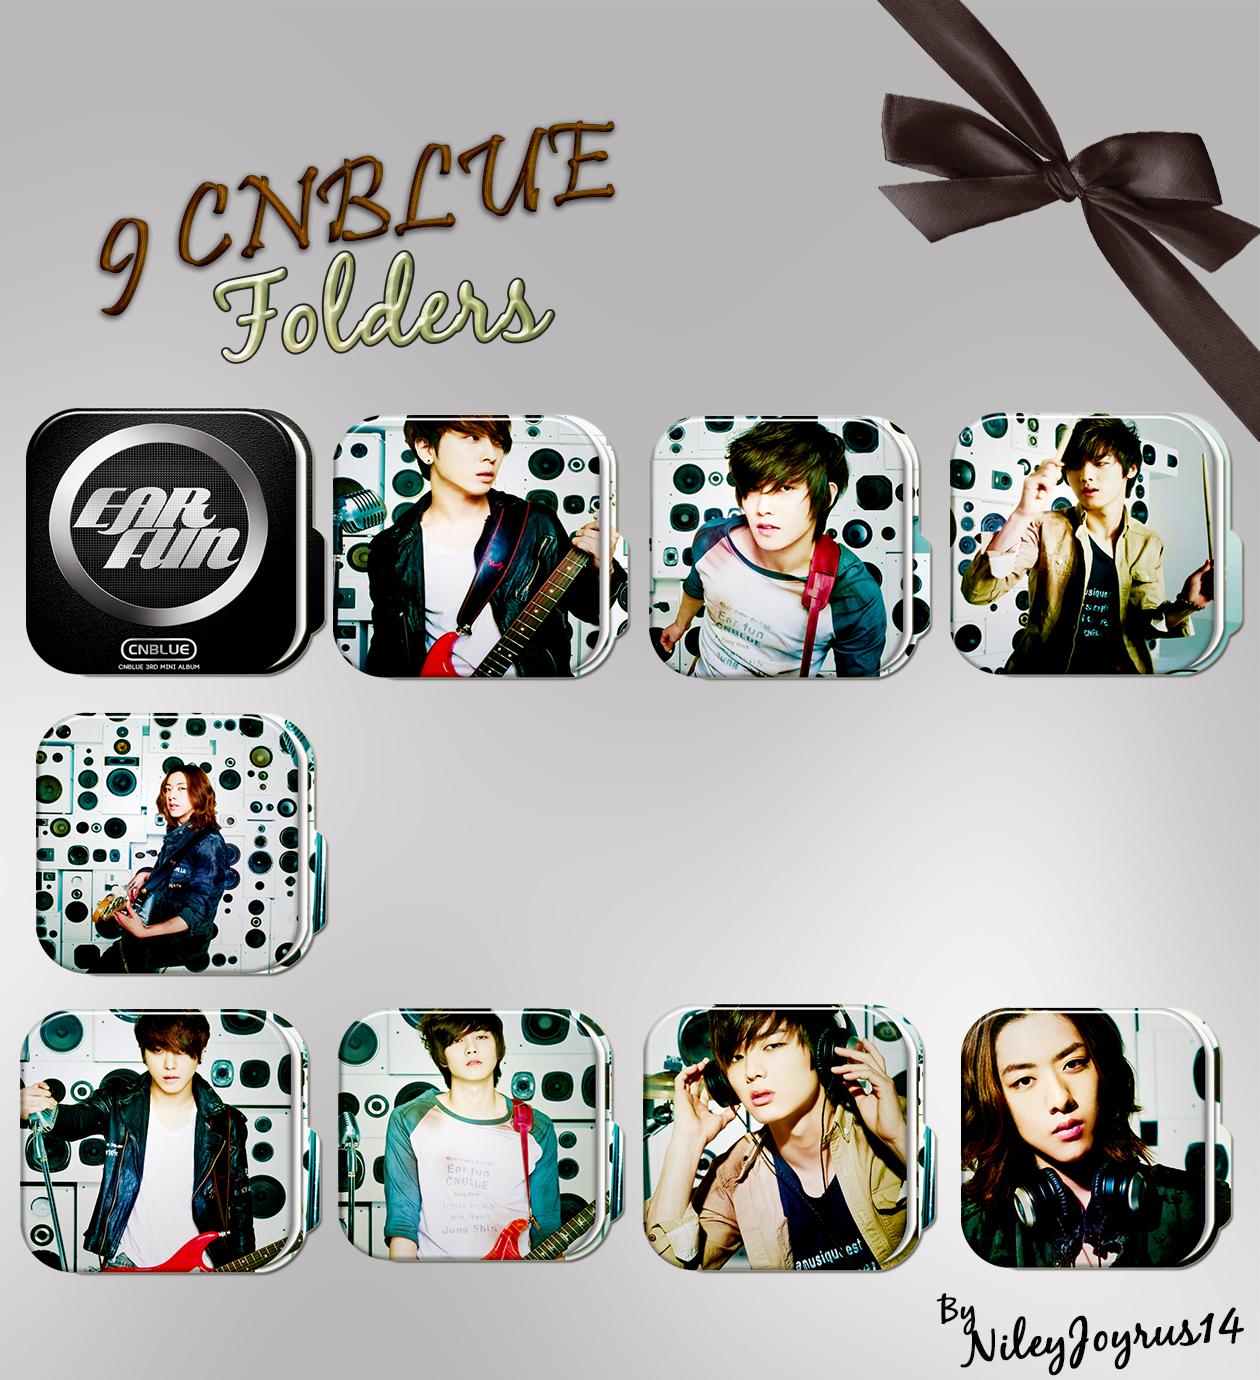 9 CNBLUE Hey You - Folders (Request) by NileyJoyrus14